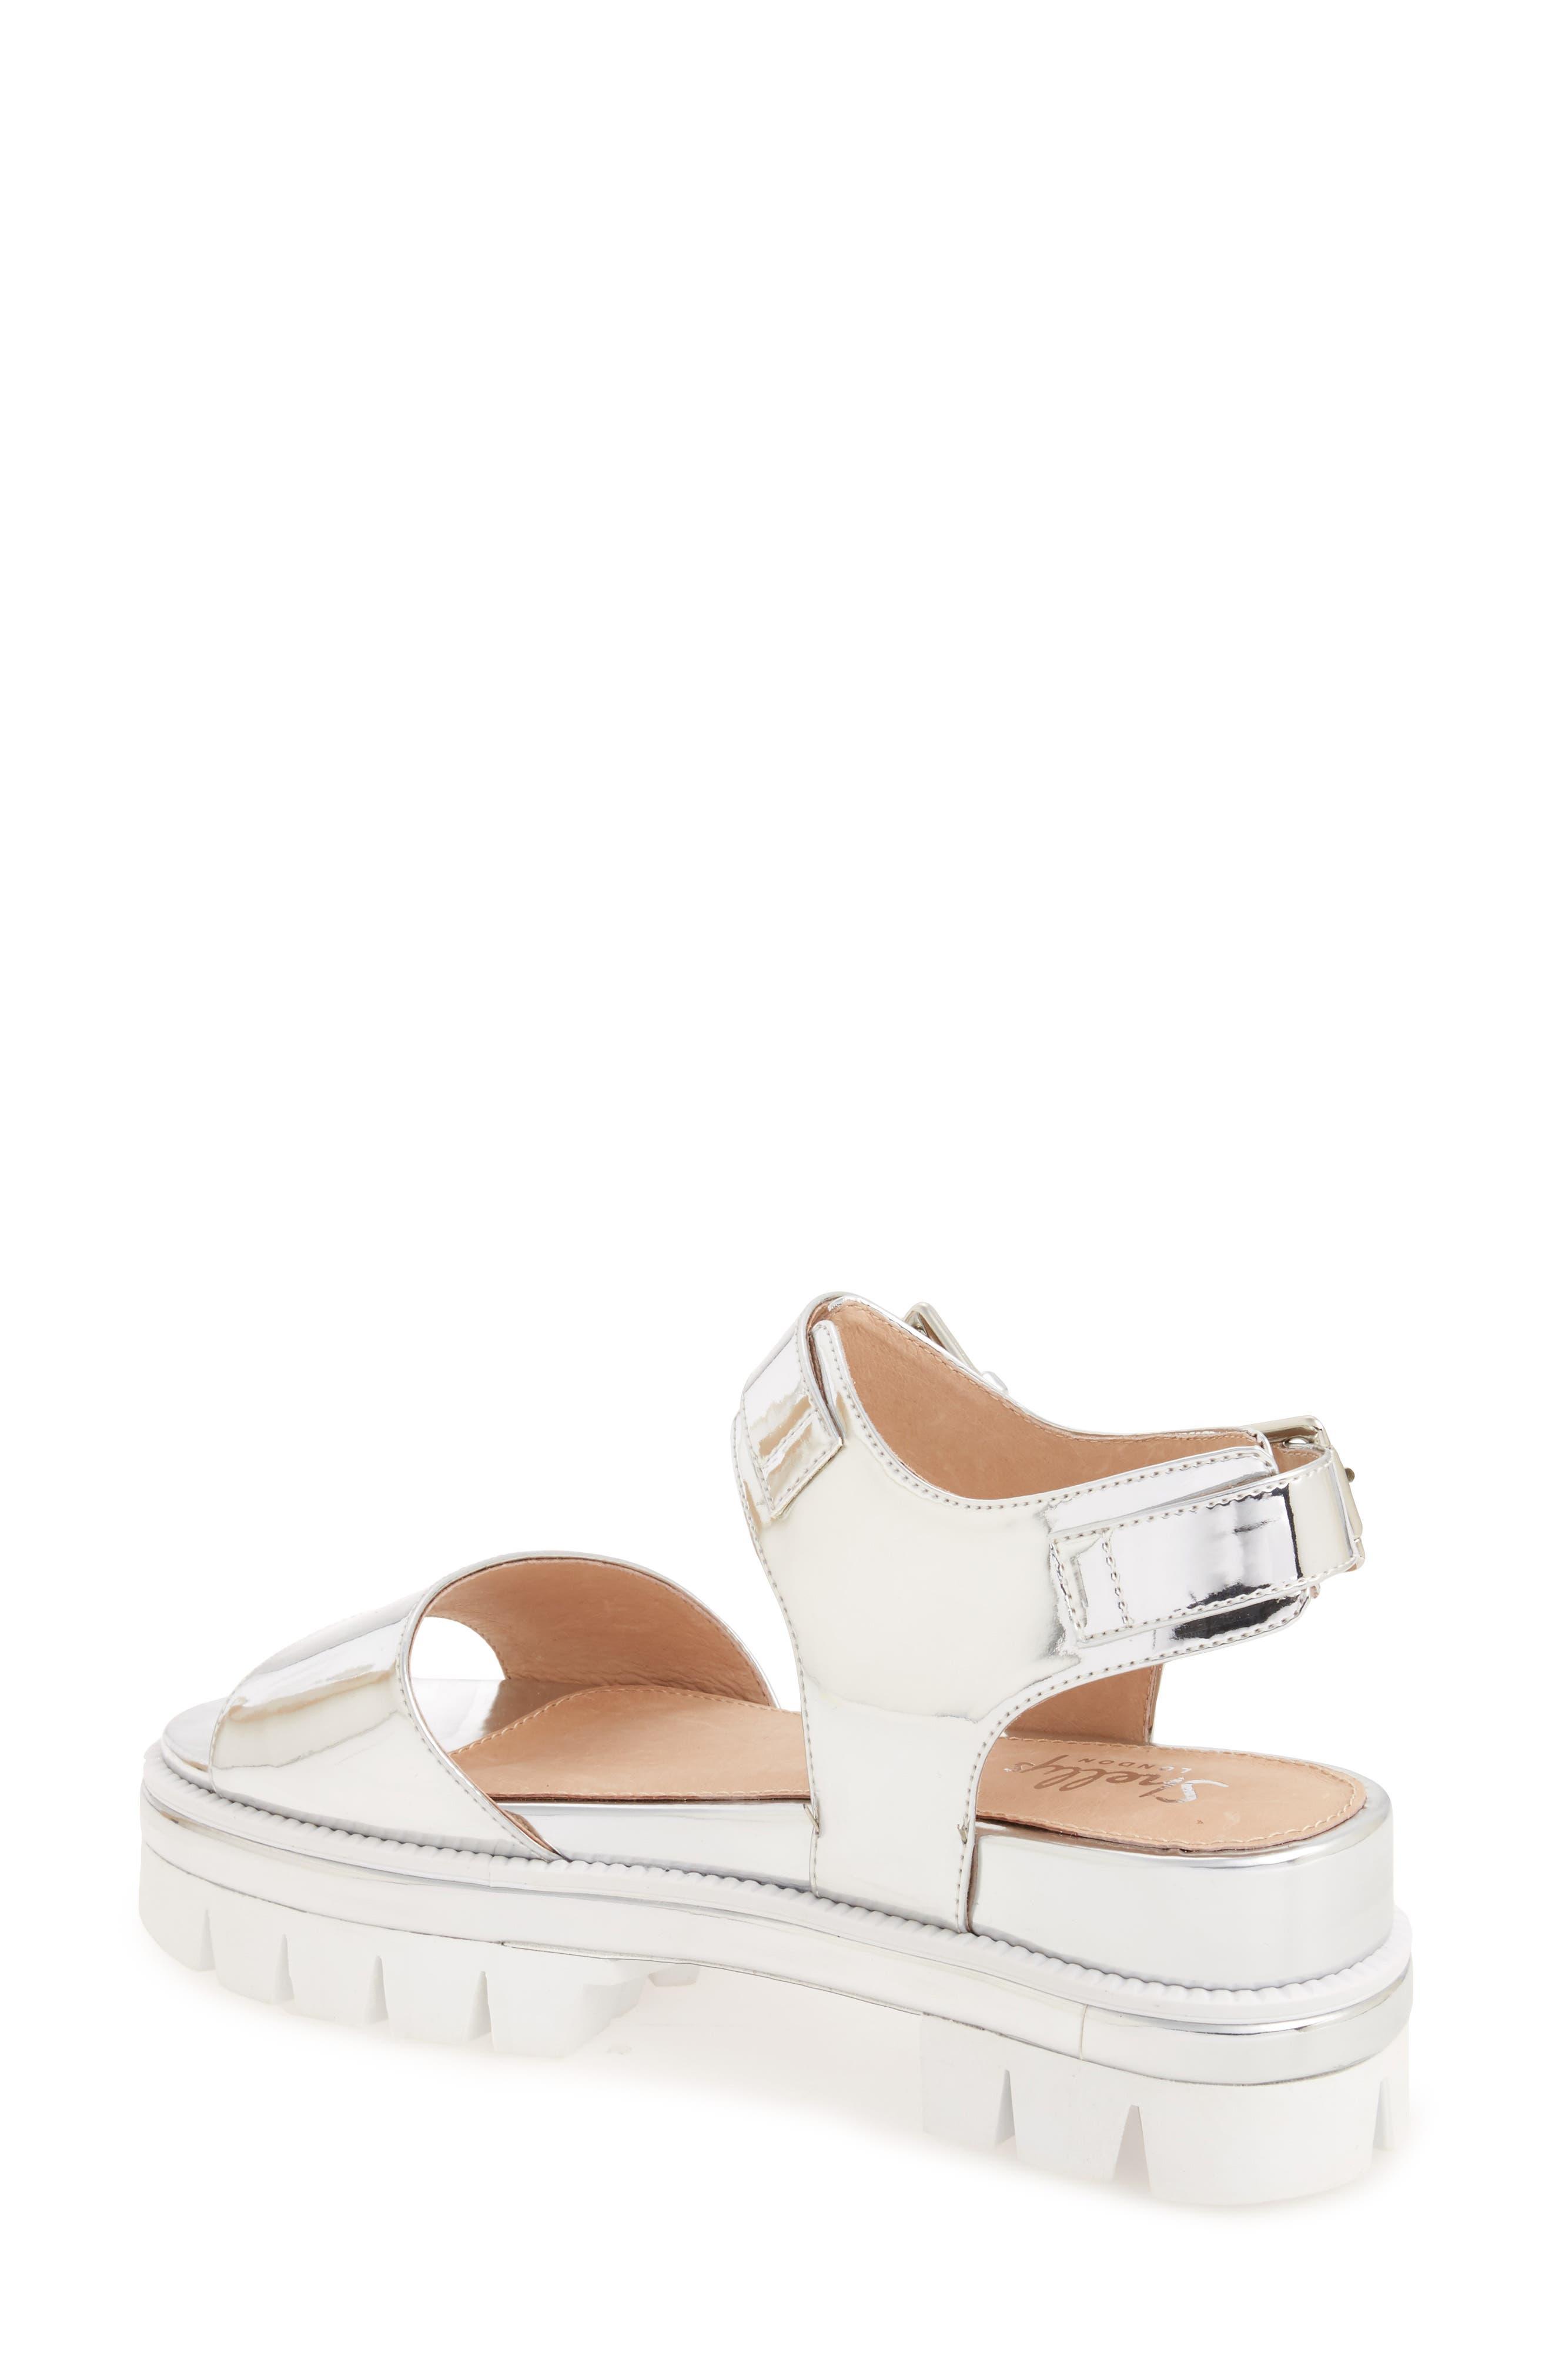 Dita Platform Sandal,                             Alternate thumbnail 2, color,                             040